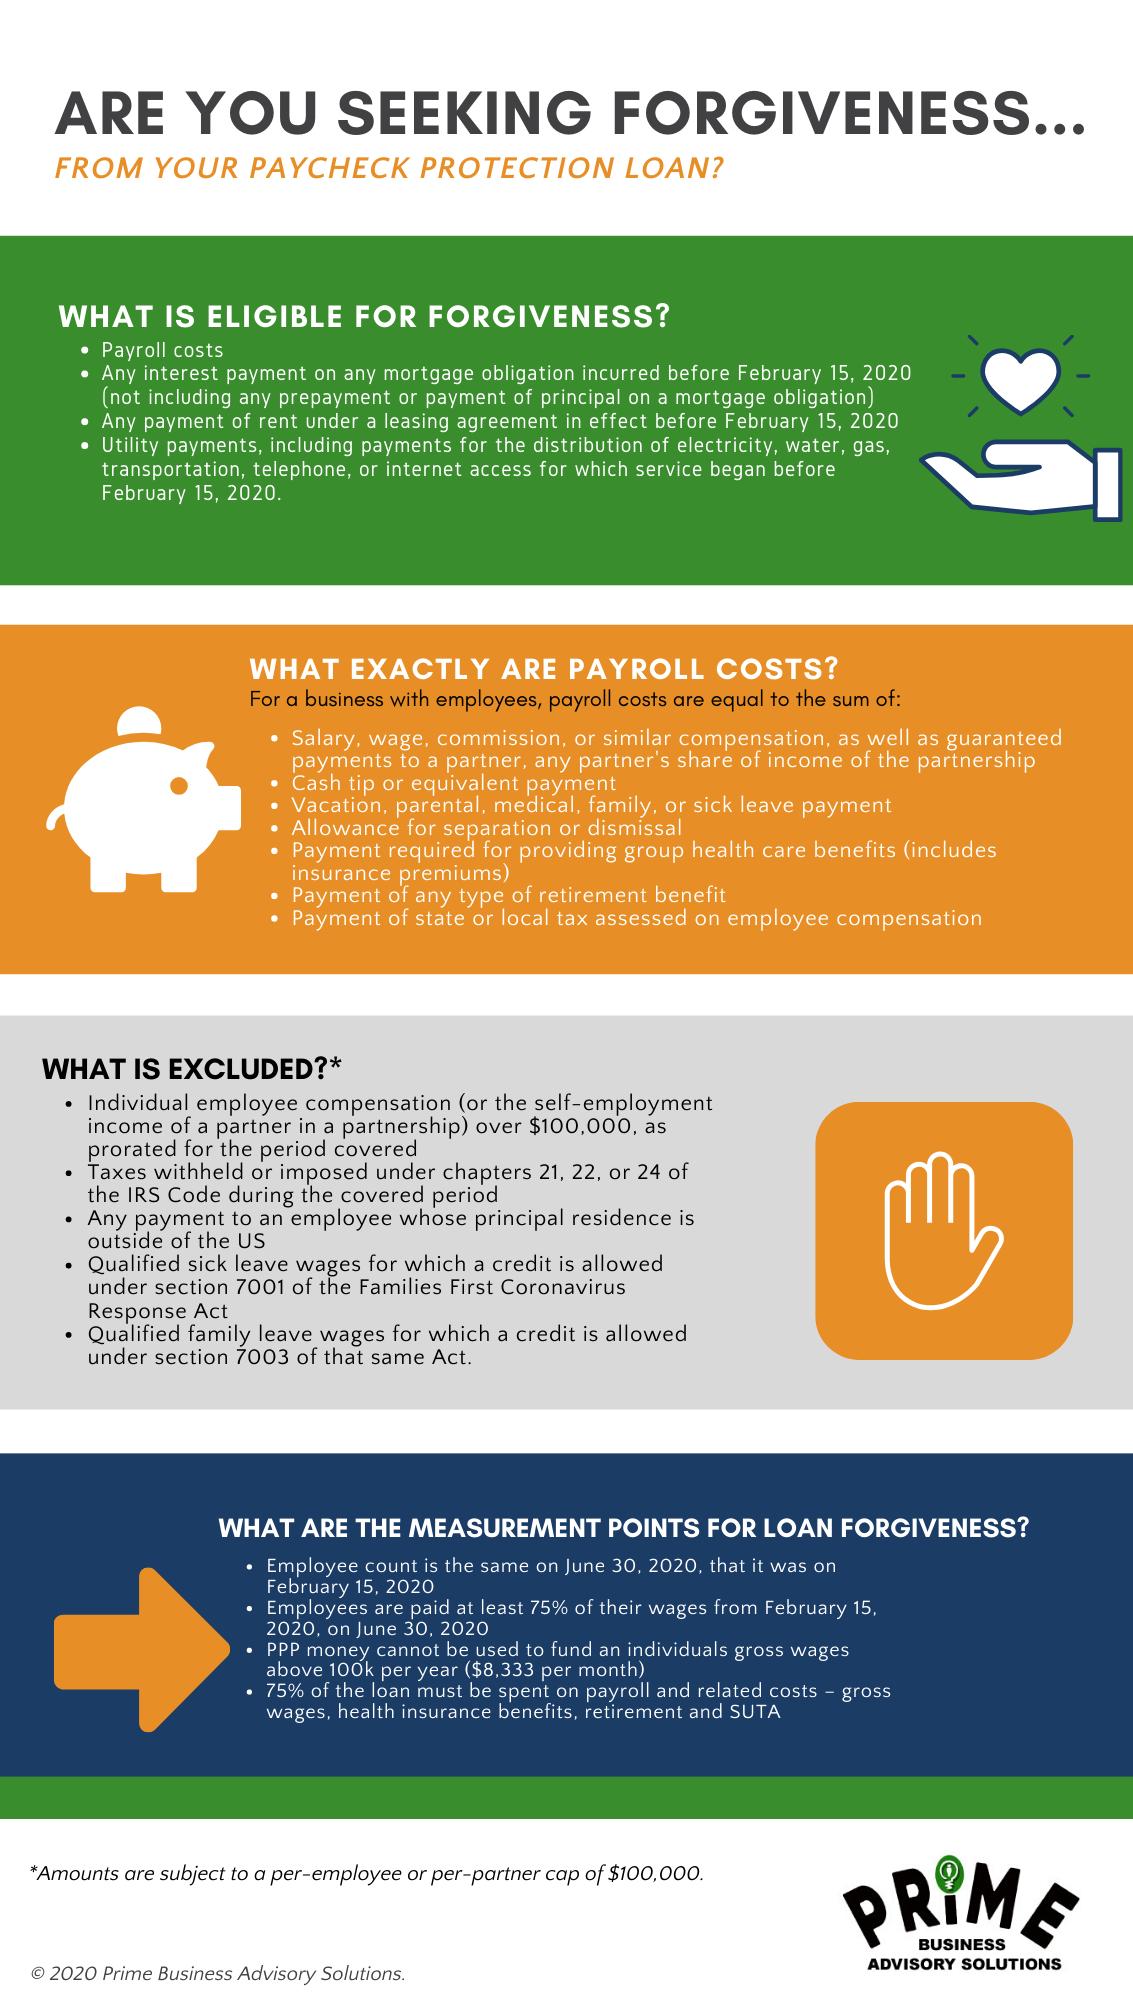 Paycheck Protection Loan Forgiveness